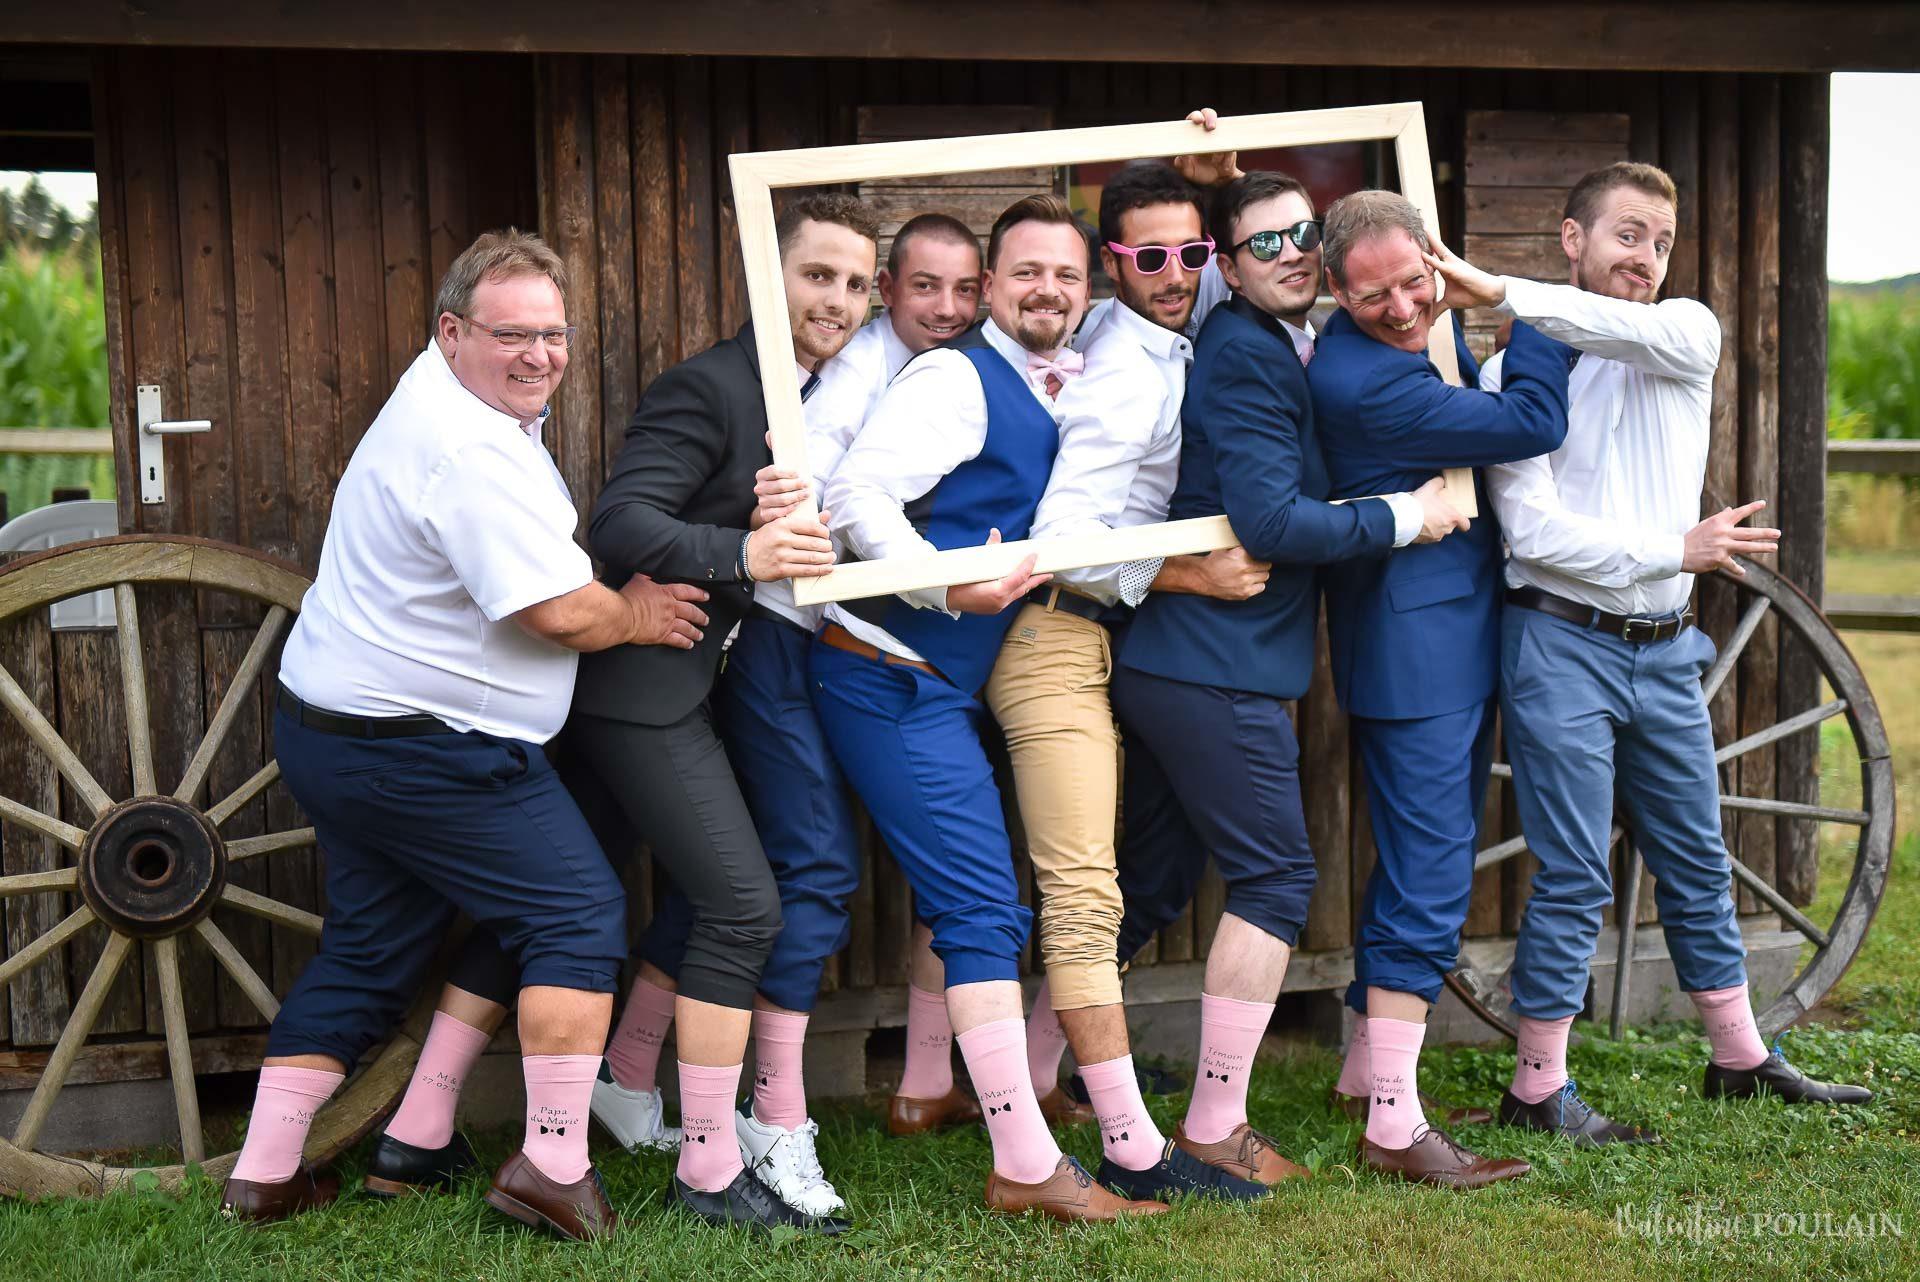 Mariage cool ferme weyerbach - Valentine Poulain cadre